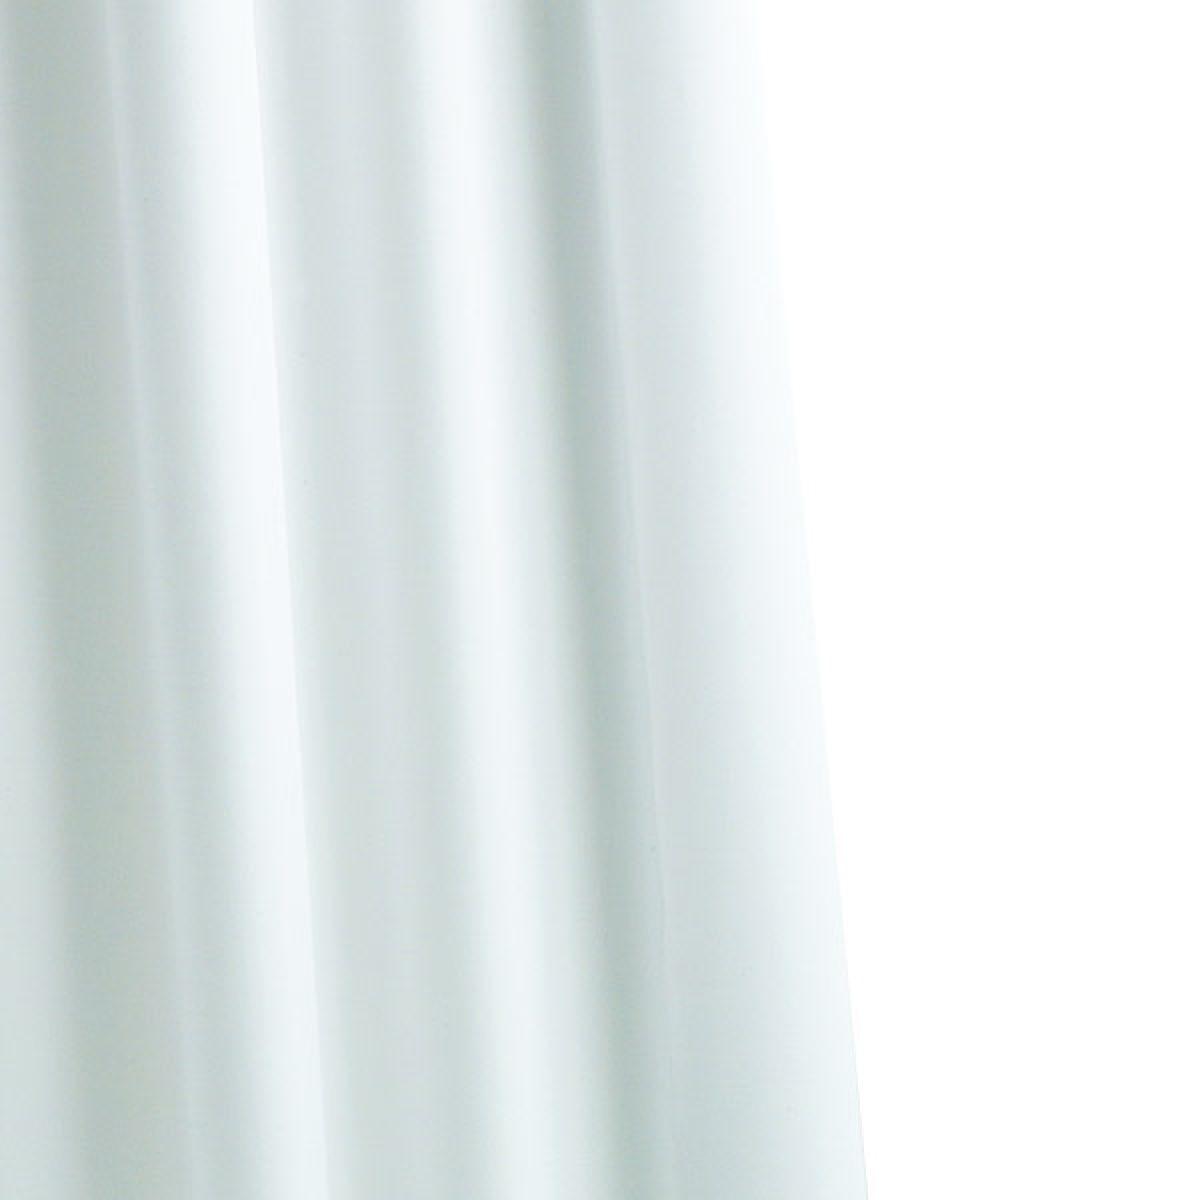 Croydex High Performance 1800 White Textile Shower Curtain